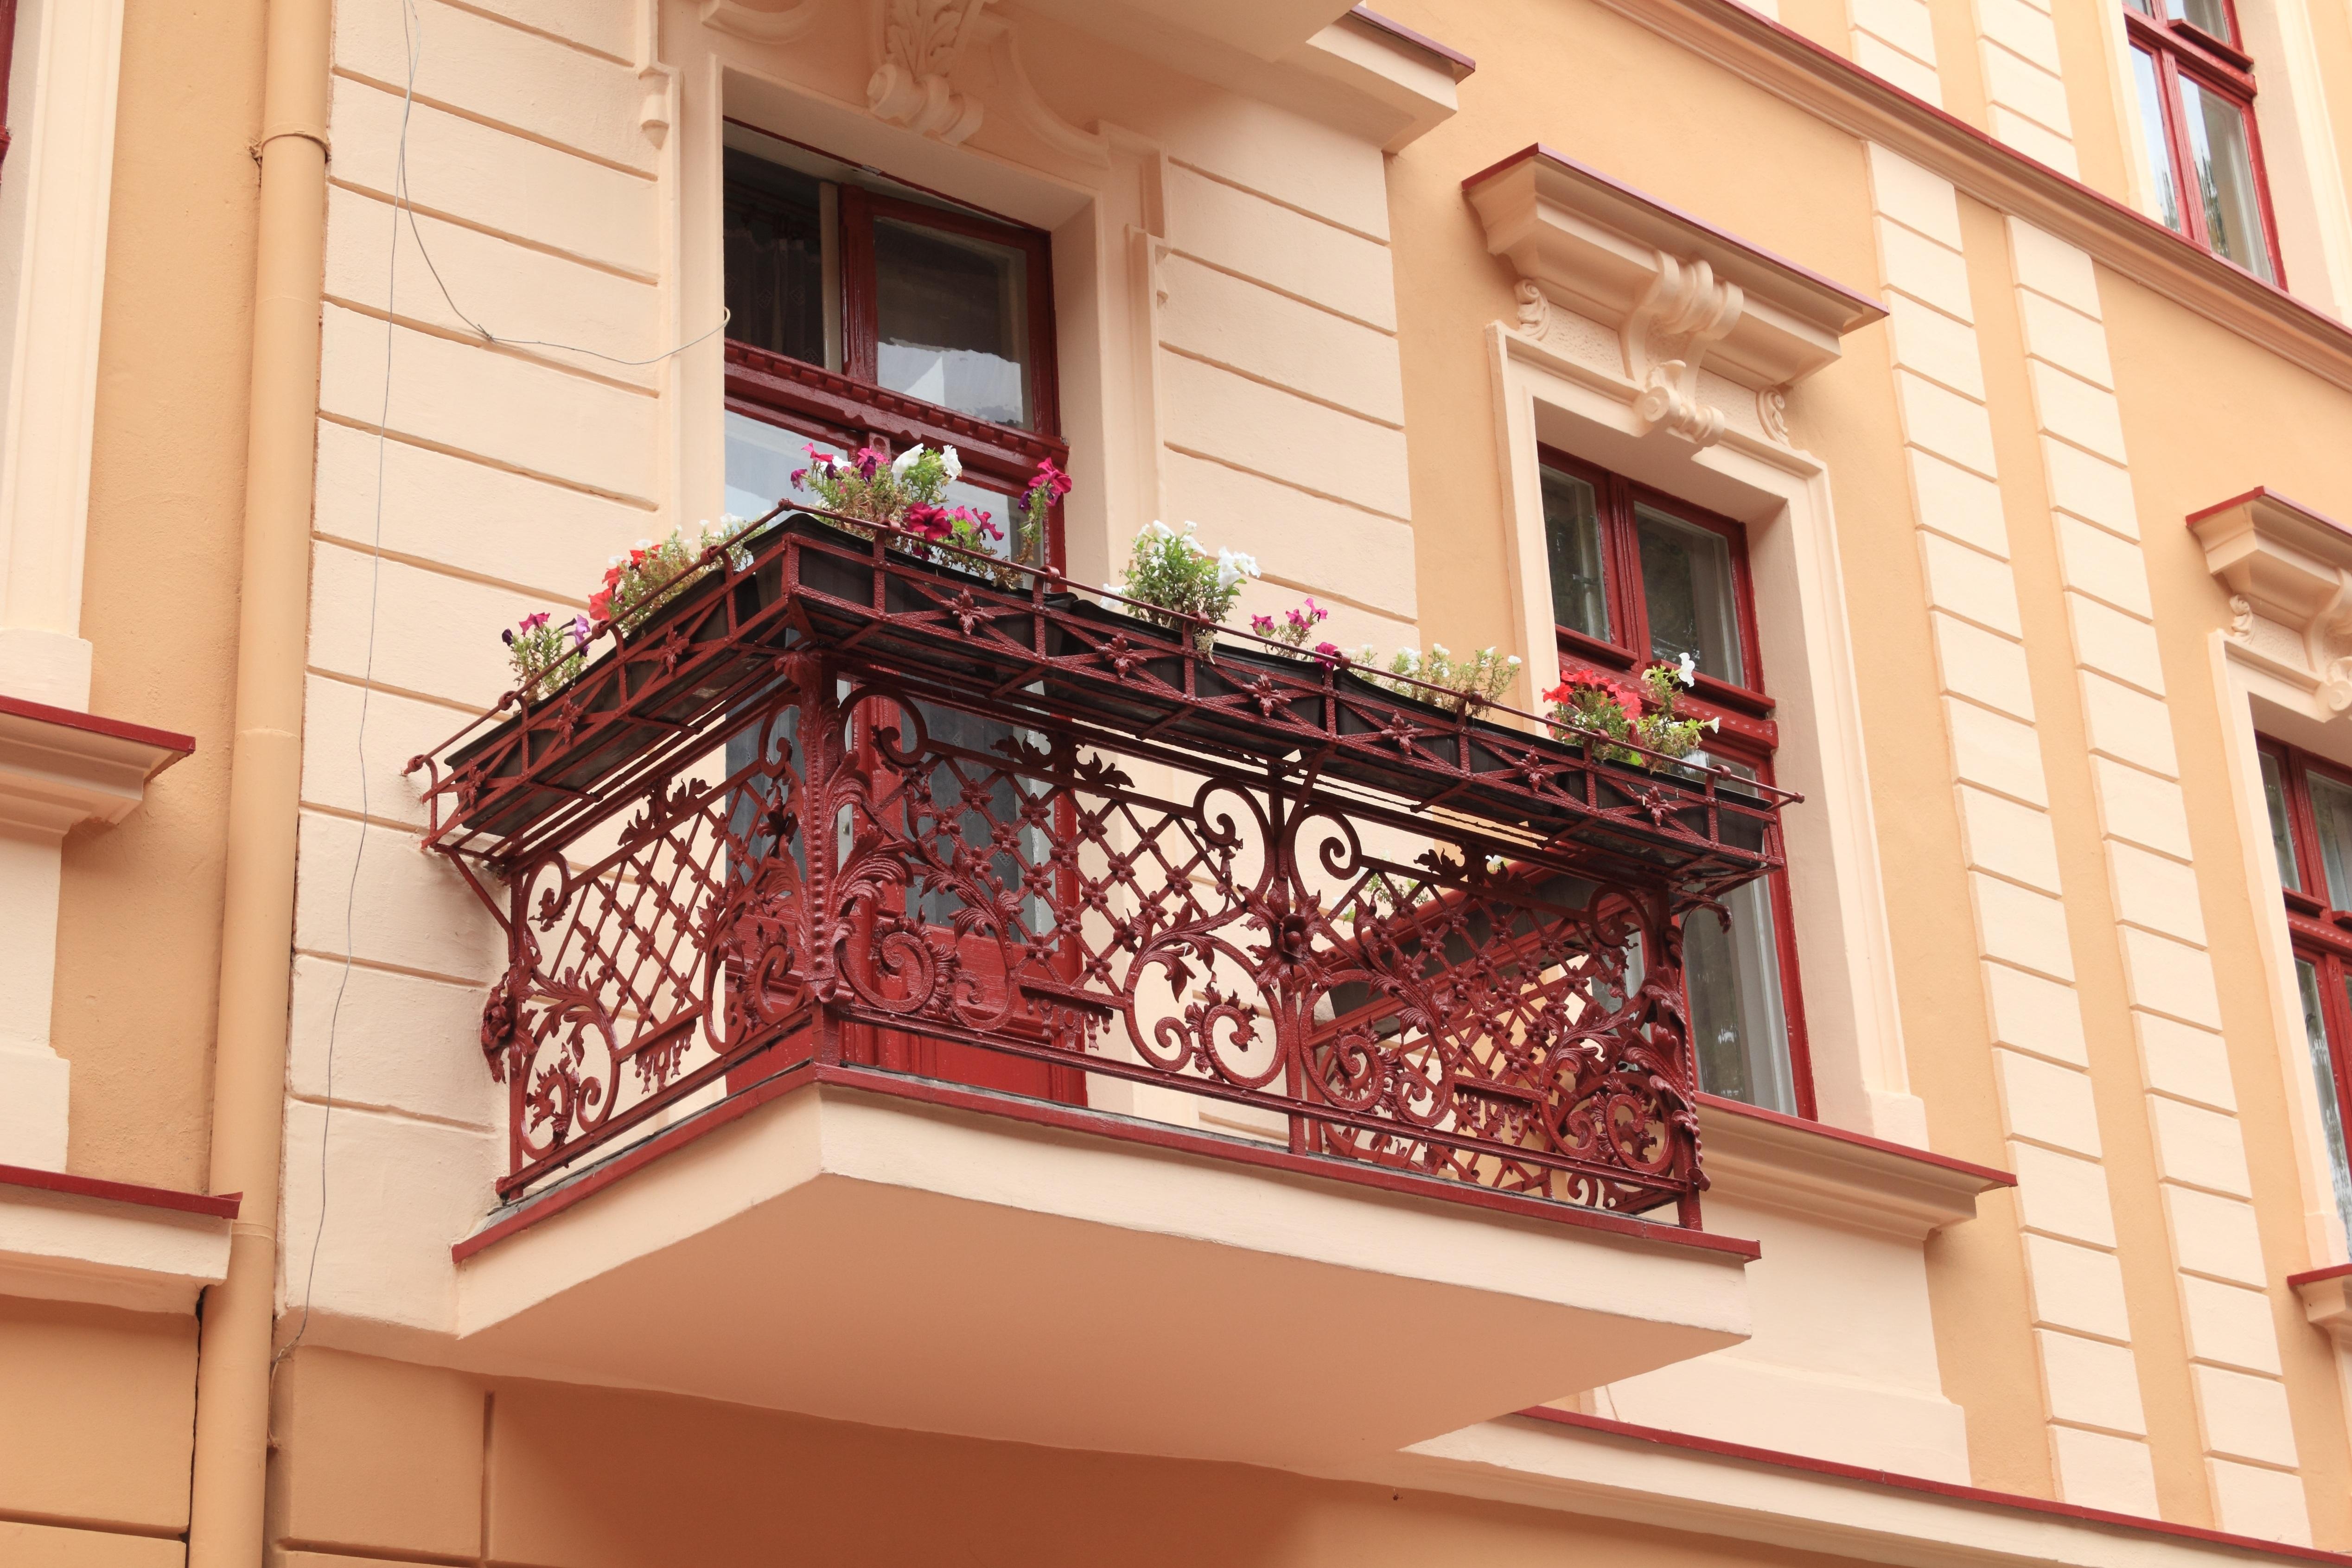 Fotos gratis arquitectura madera casa ventana porche for Diseno de casa habitacion